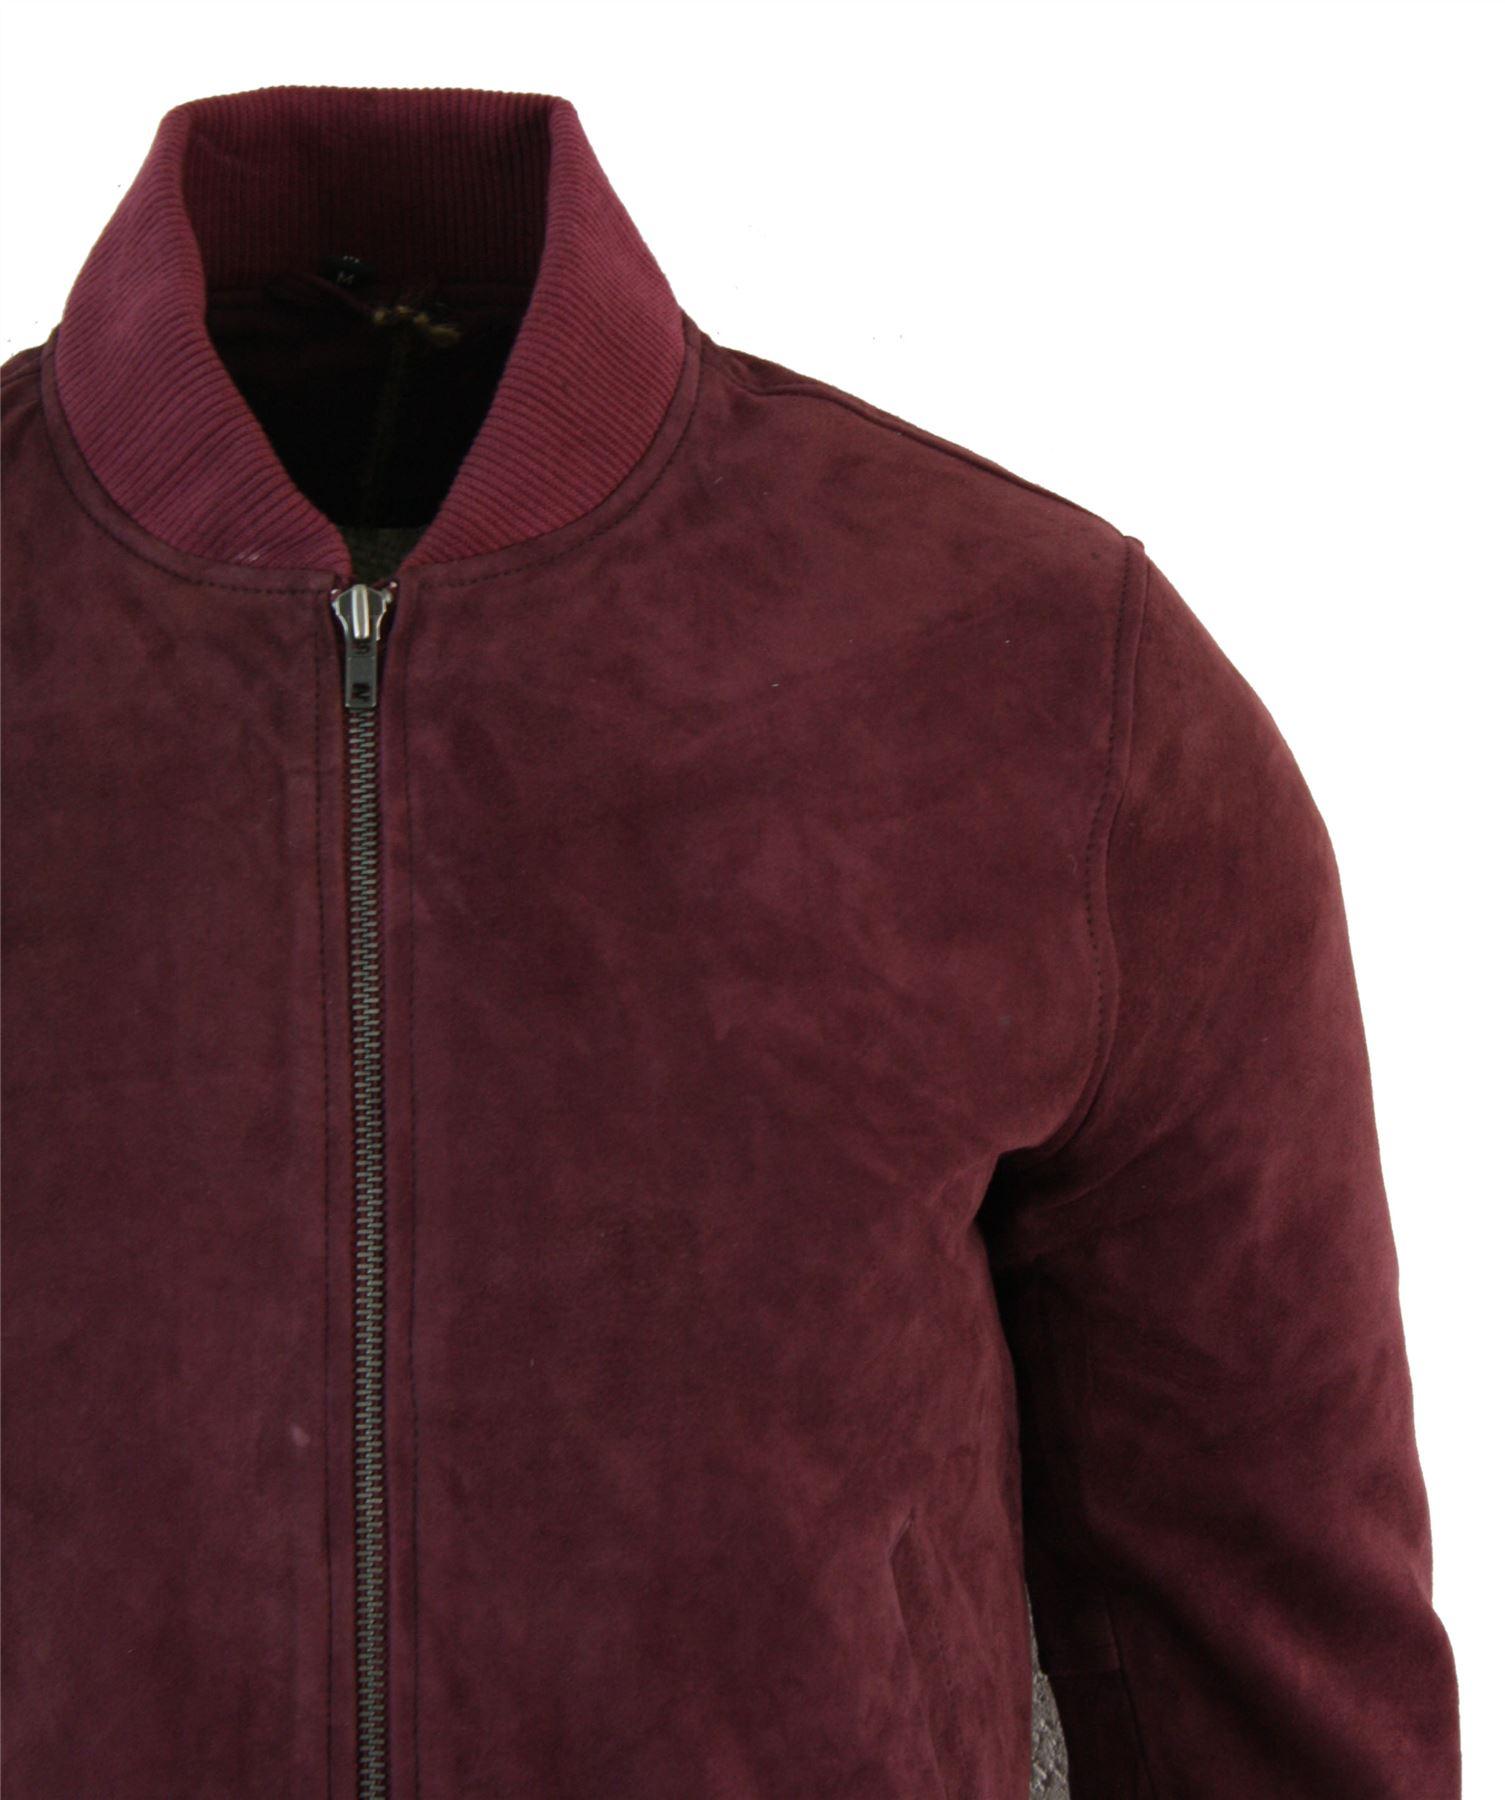 Mens Real Suede Leather Varsity Bomber Jacket Classic Vintage Camel Black